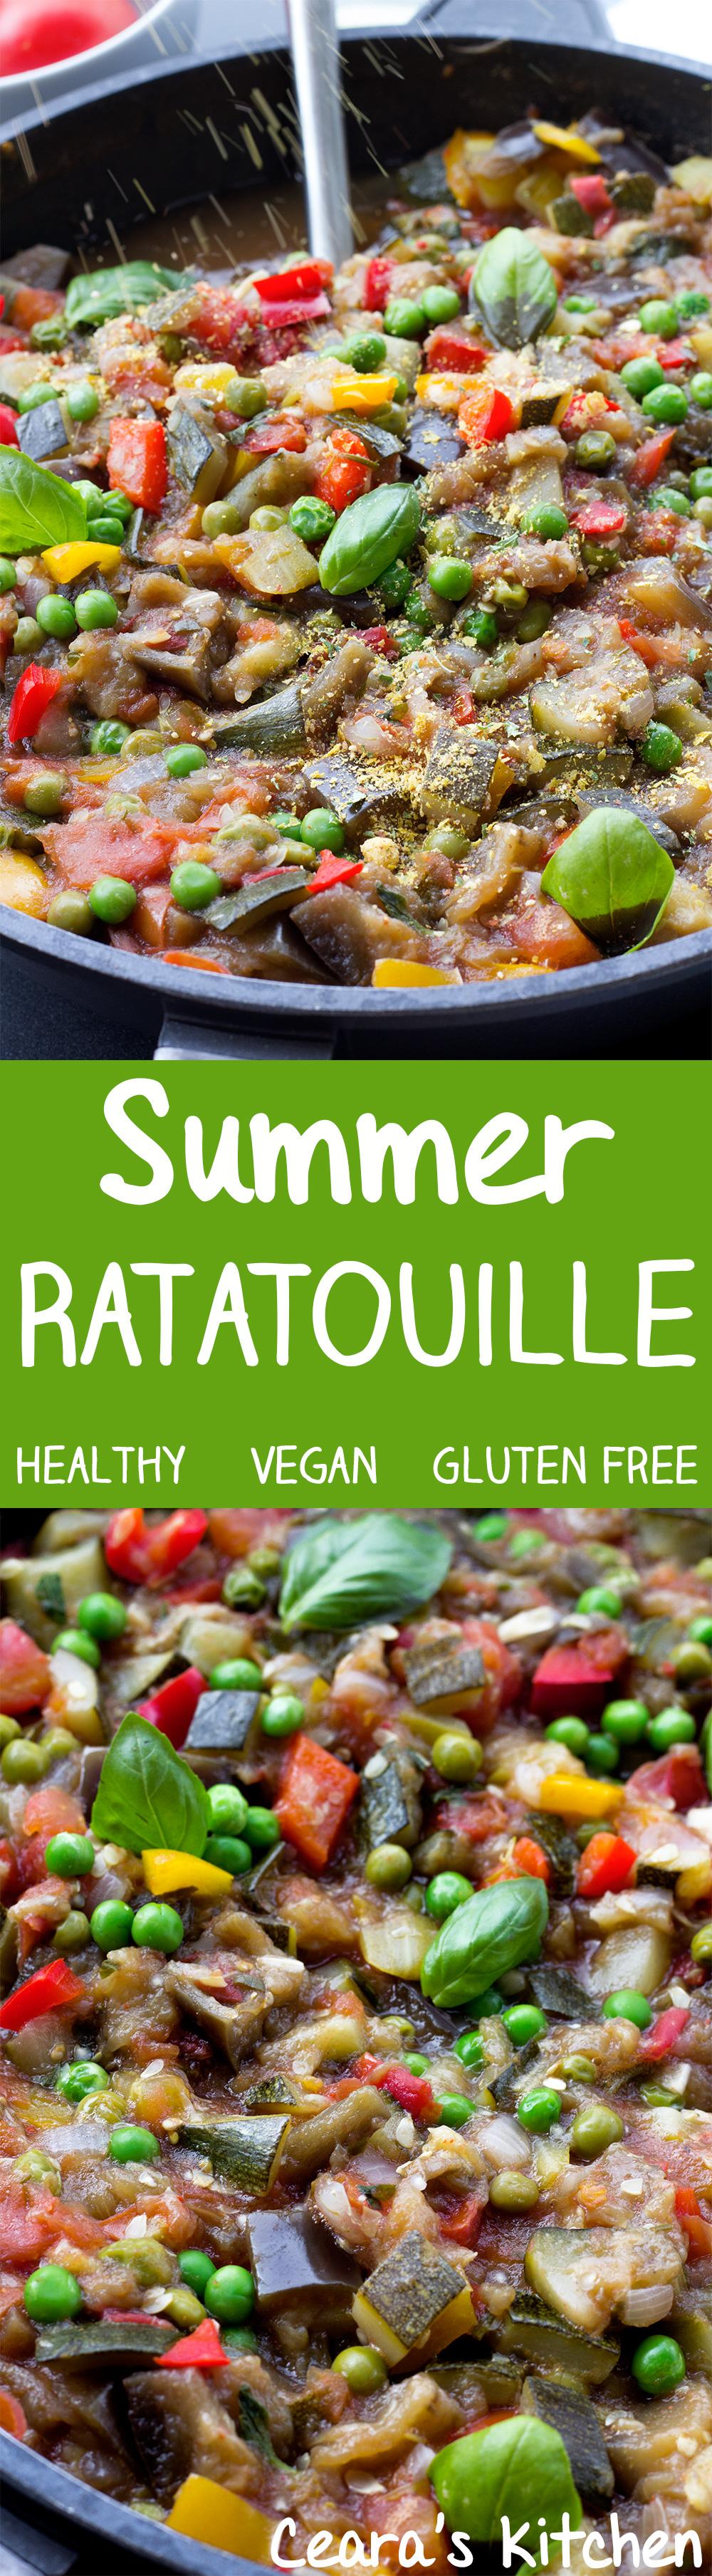 Summer Ratatouille Vegan Healthy Gluten Free made